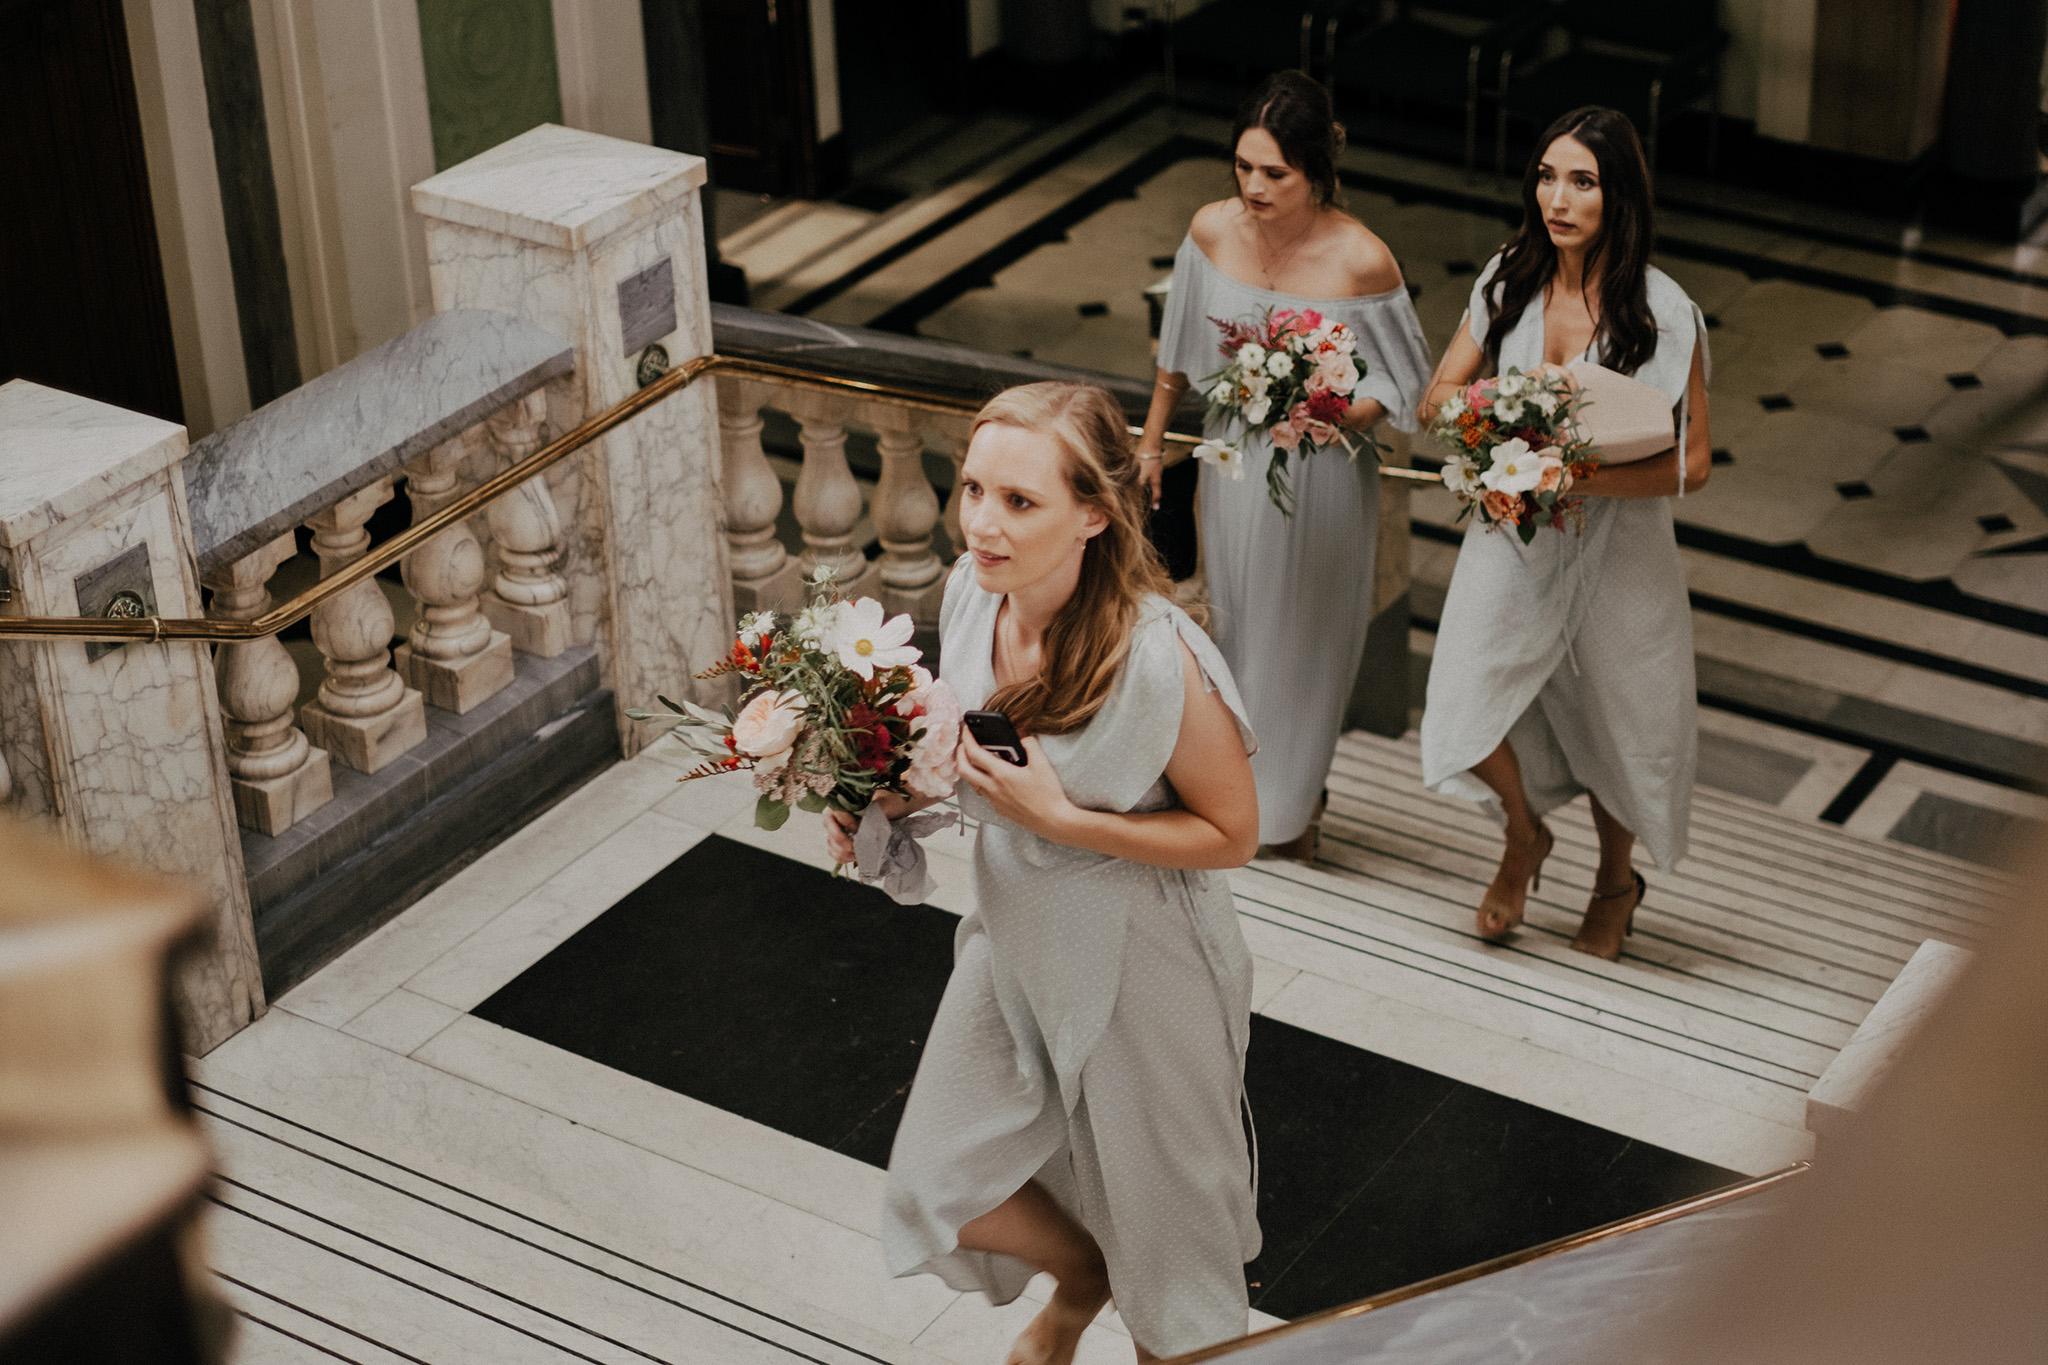 Islington-town-hall-wedding19.jpg